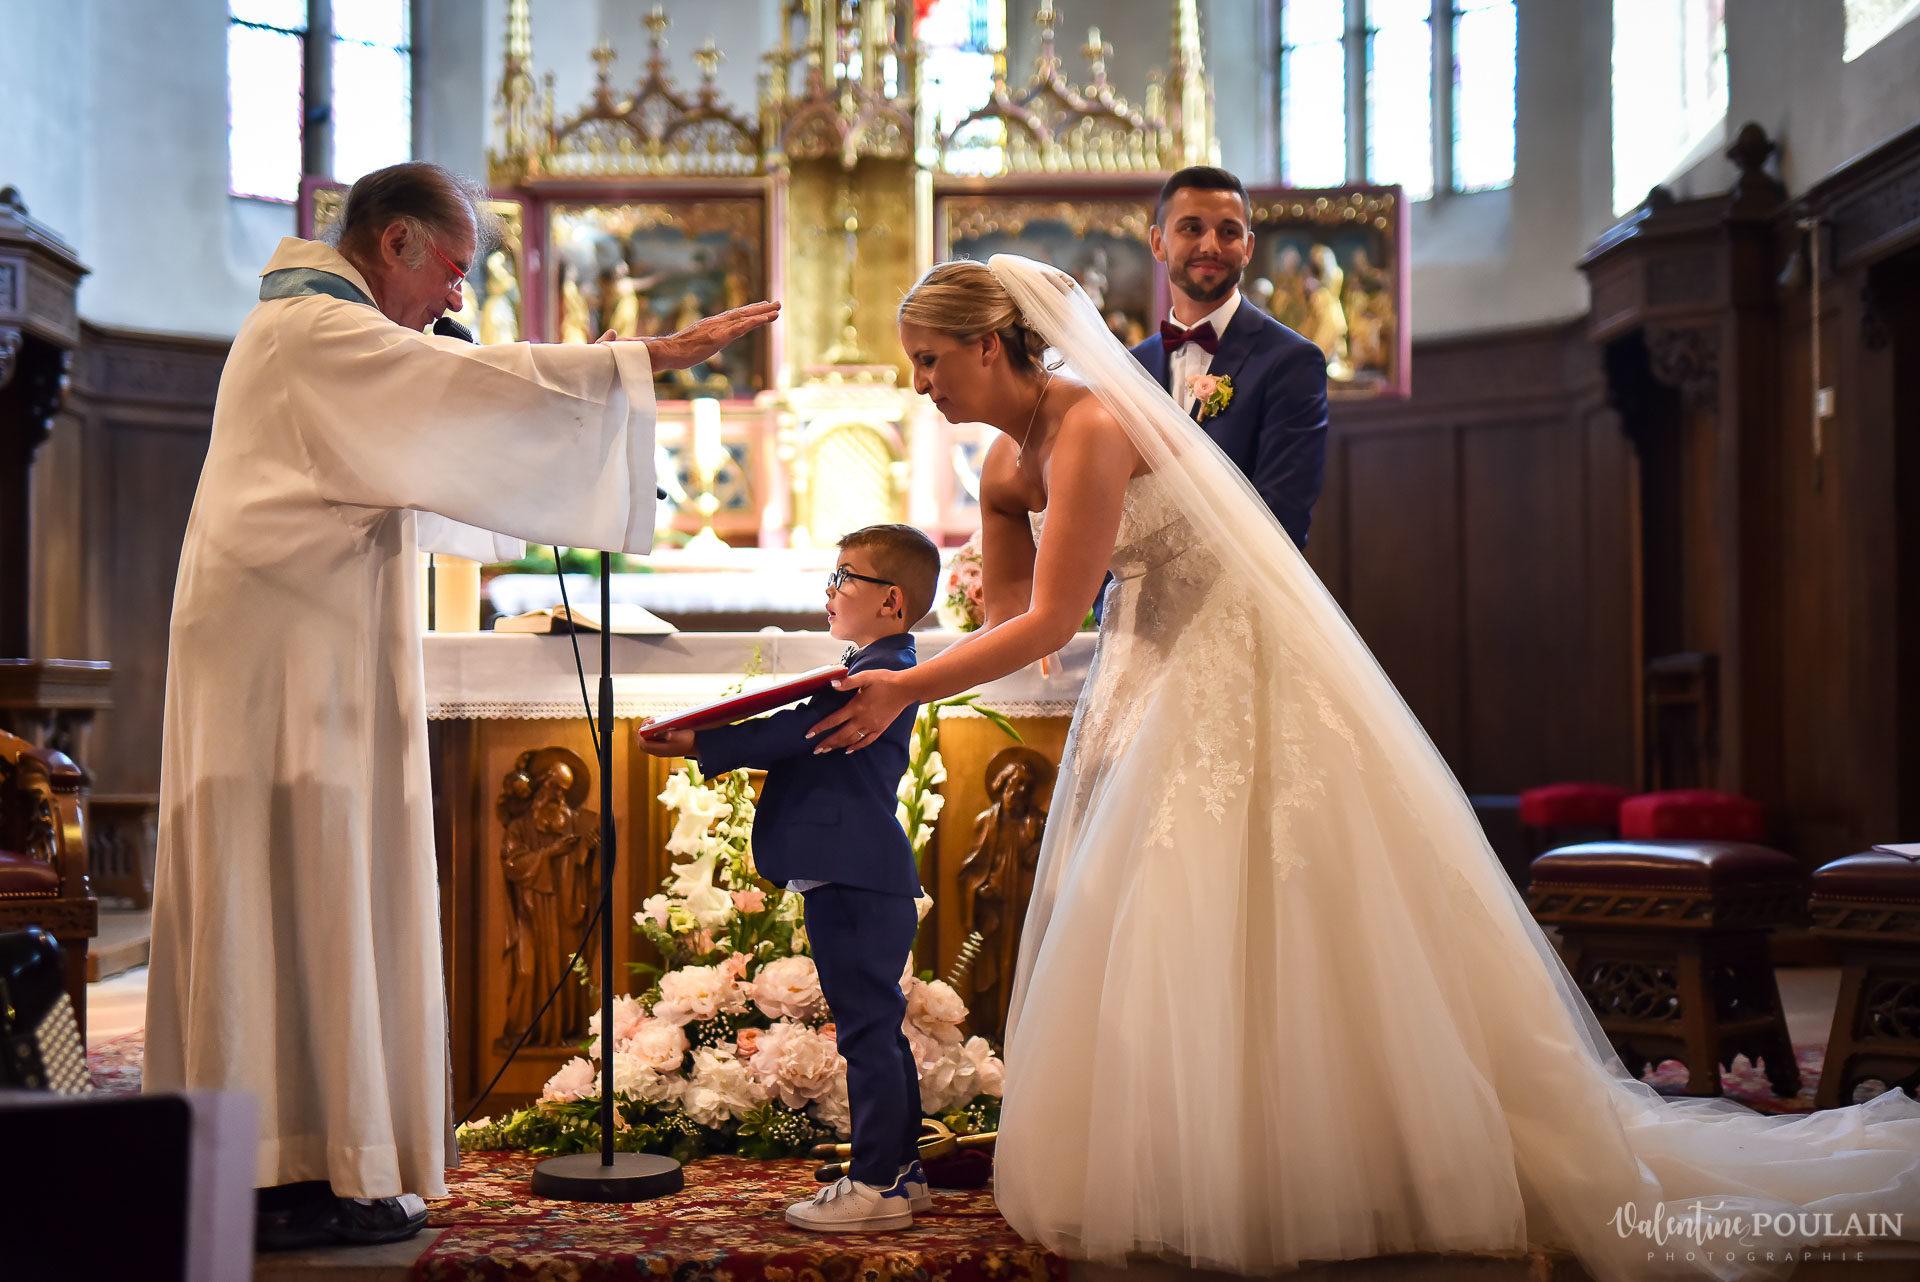 Mariage fun Petit Wettolsheim - Valentine Poulain prêtre